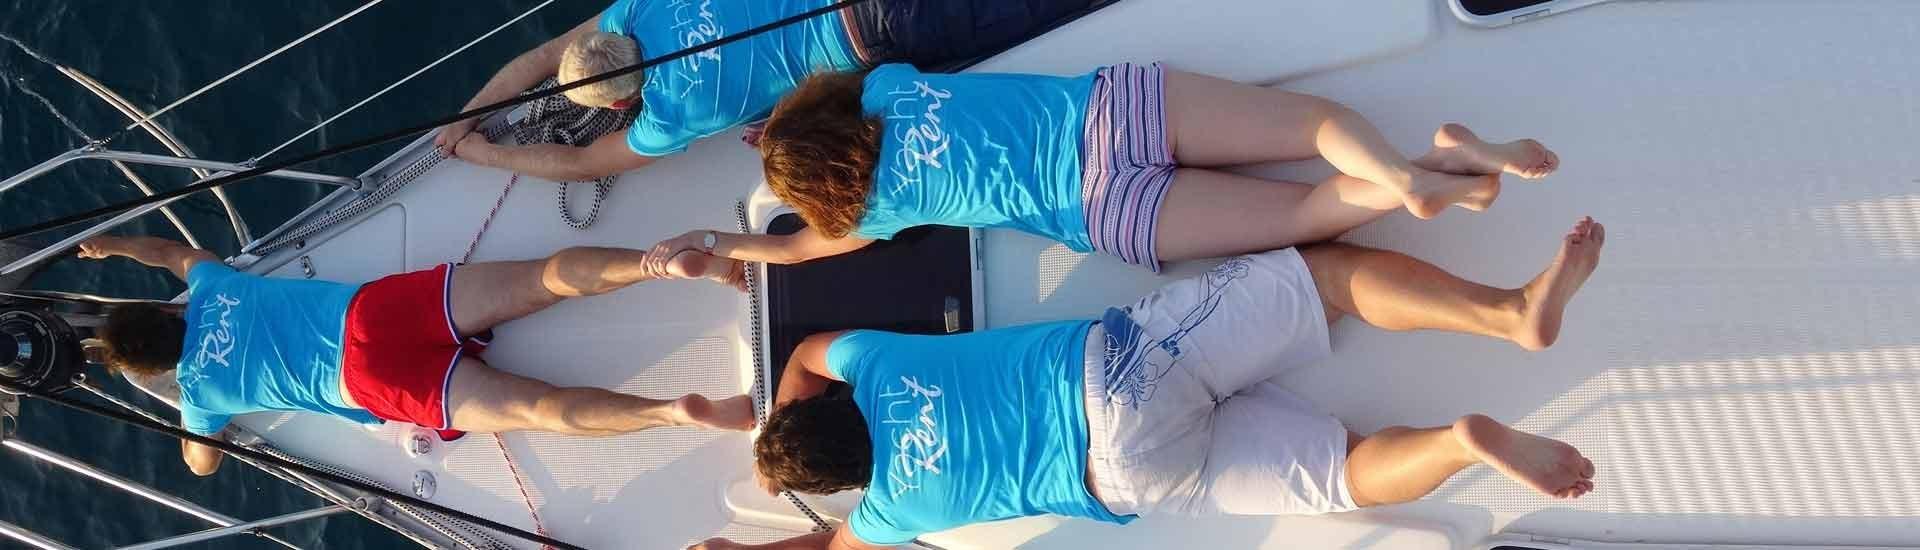 Yacht-Rent na leđima